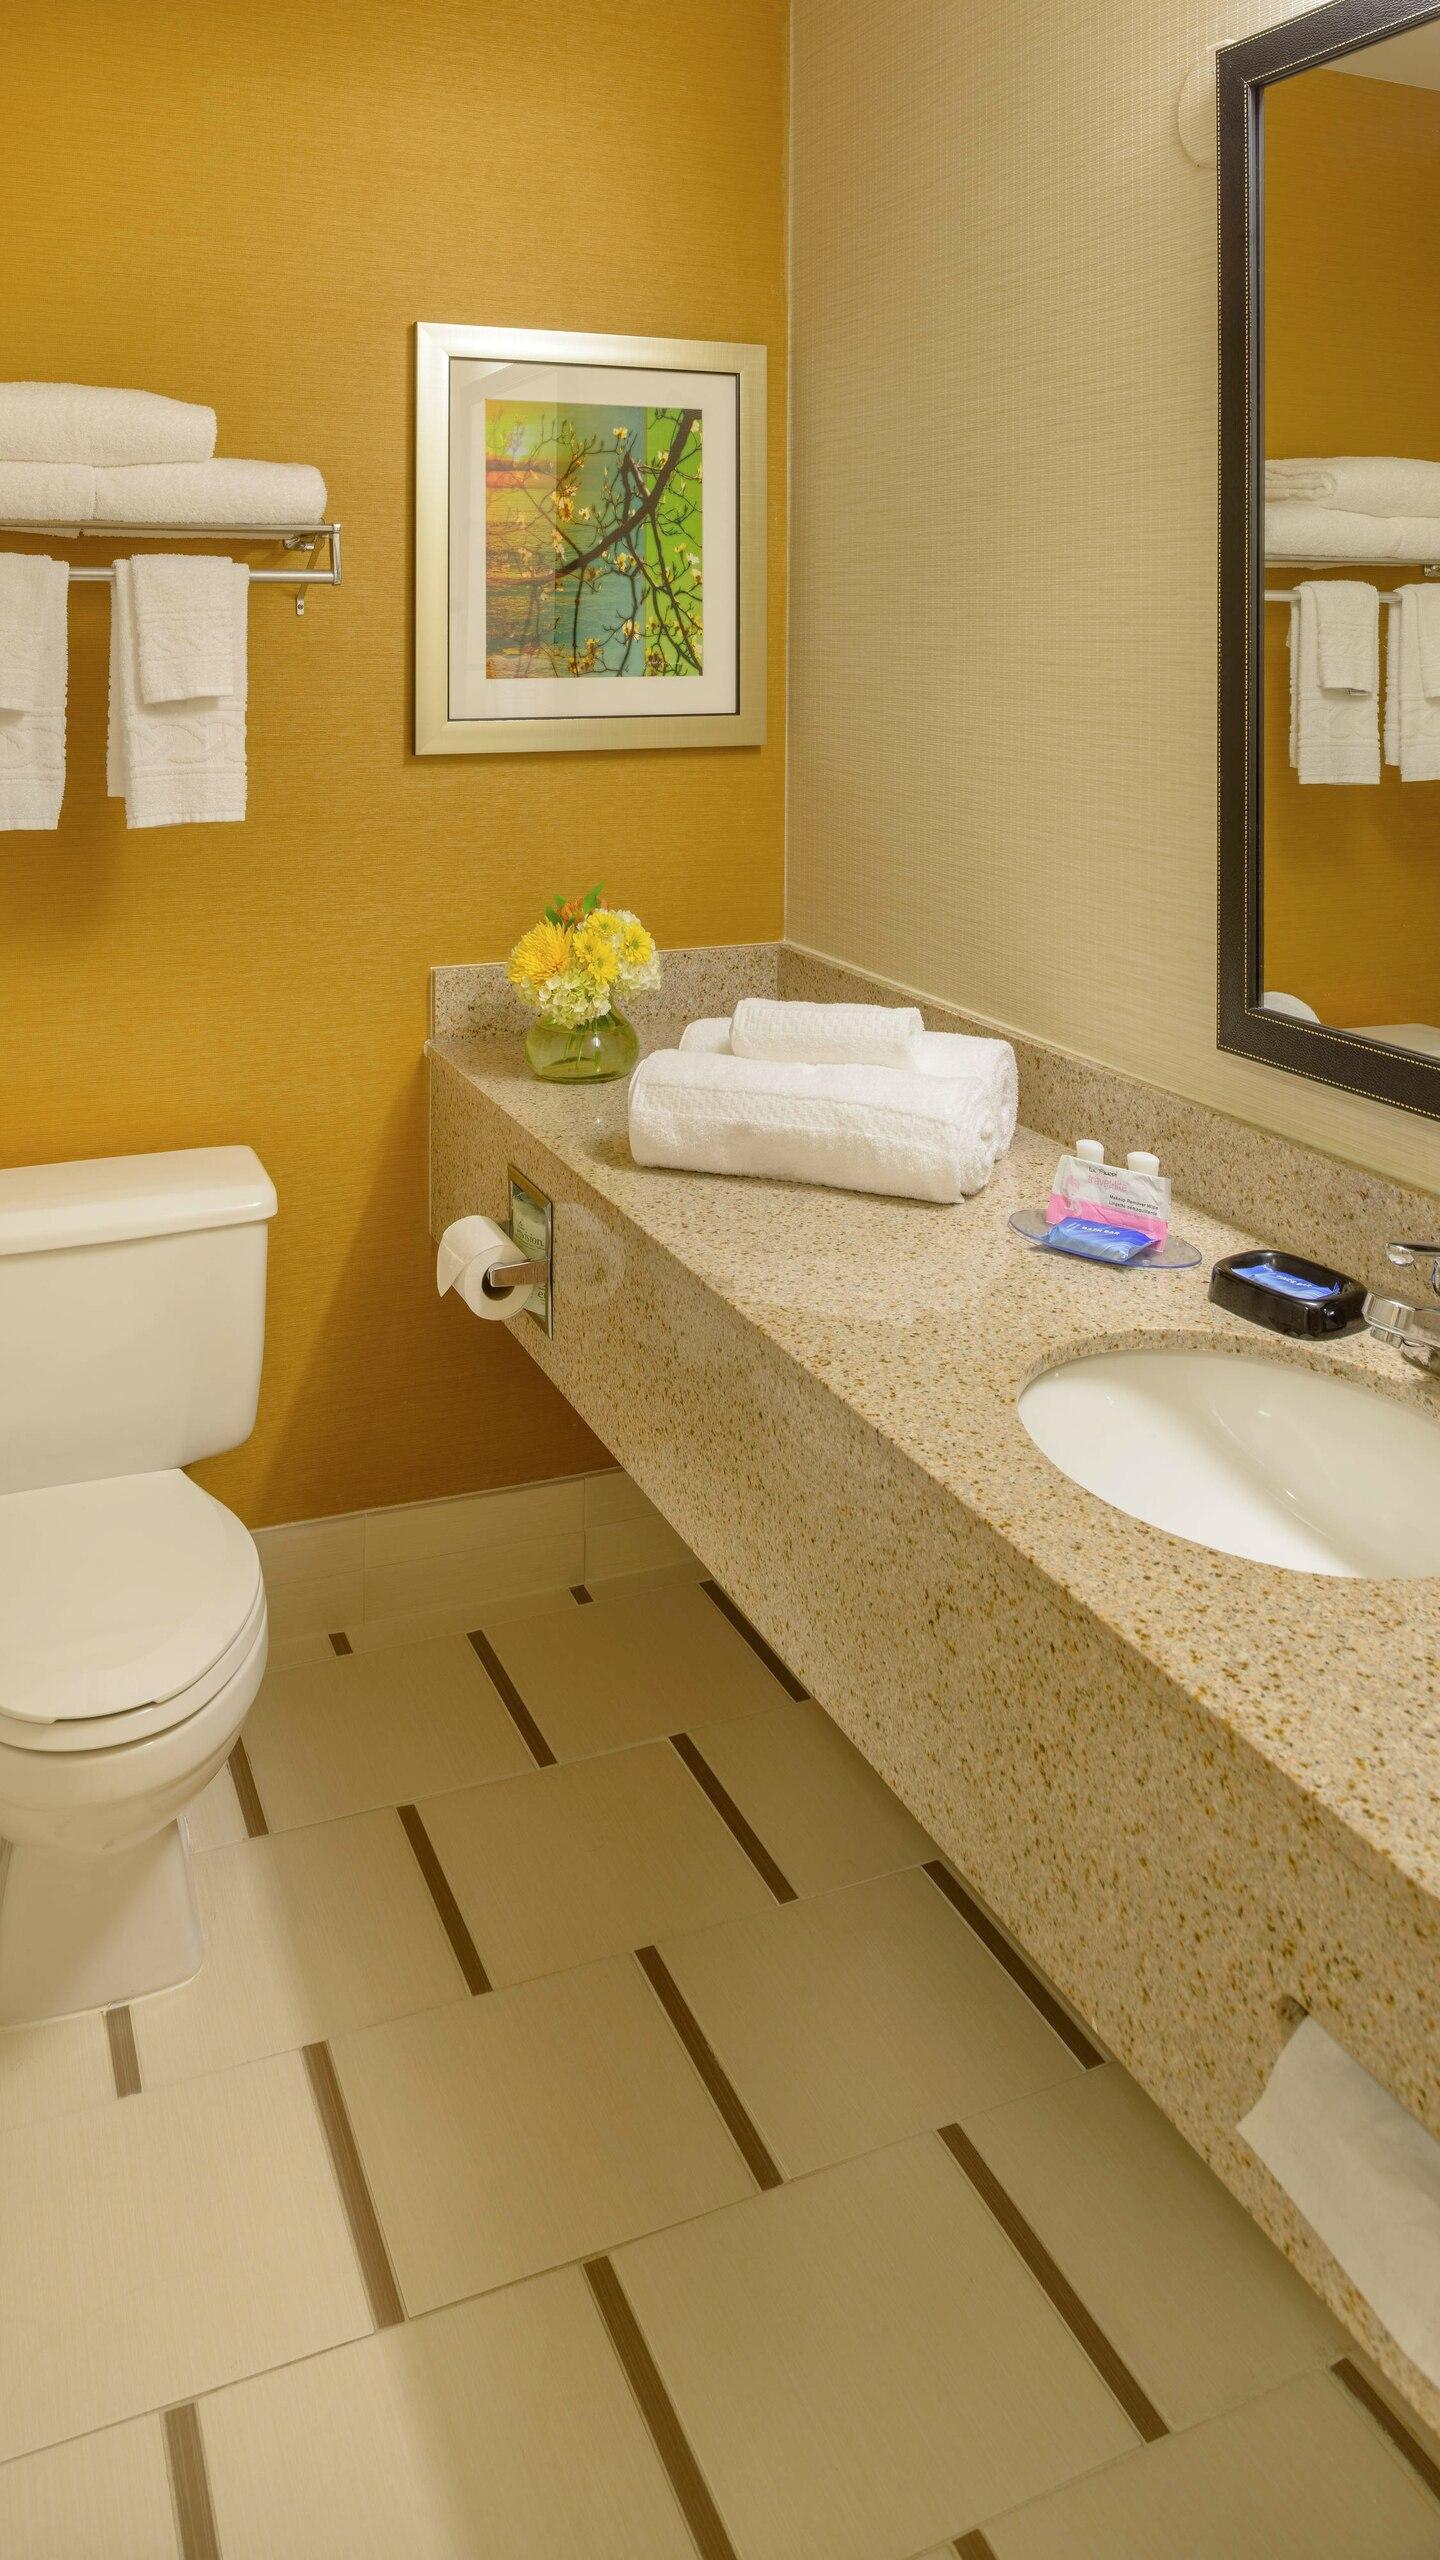 5 FFI Collinsville stlcl-bathroom-0024-ver-wide.jpg